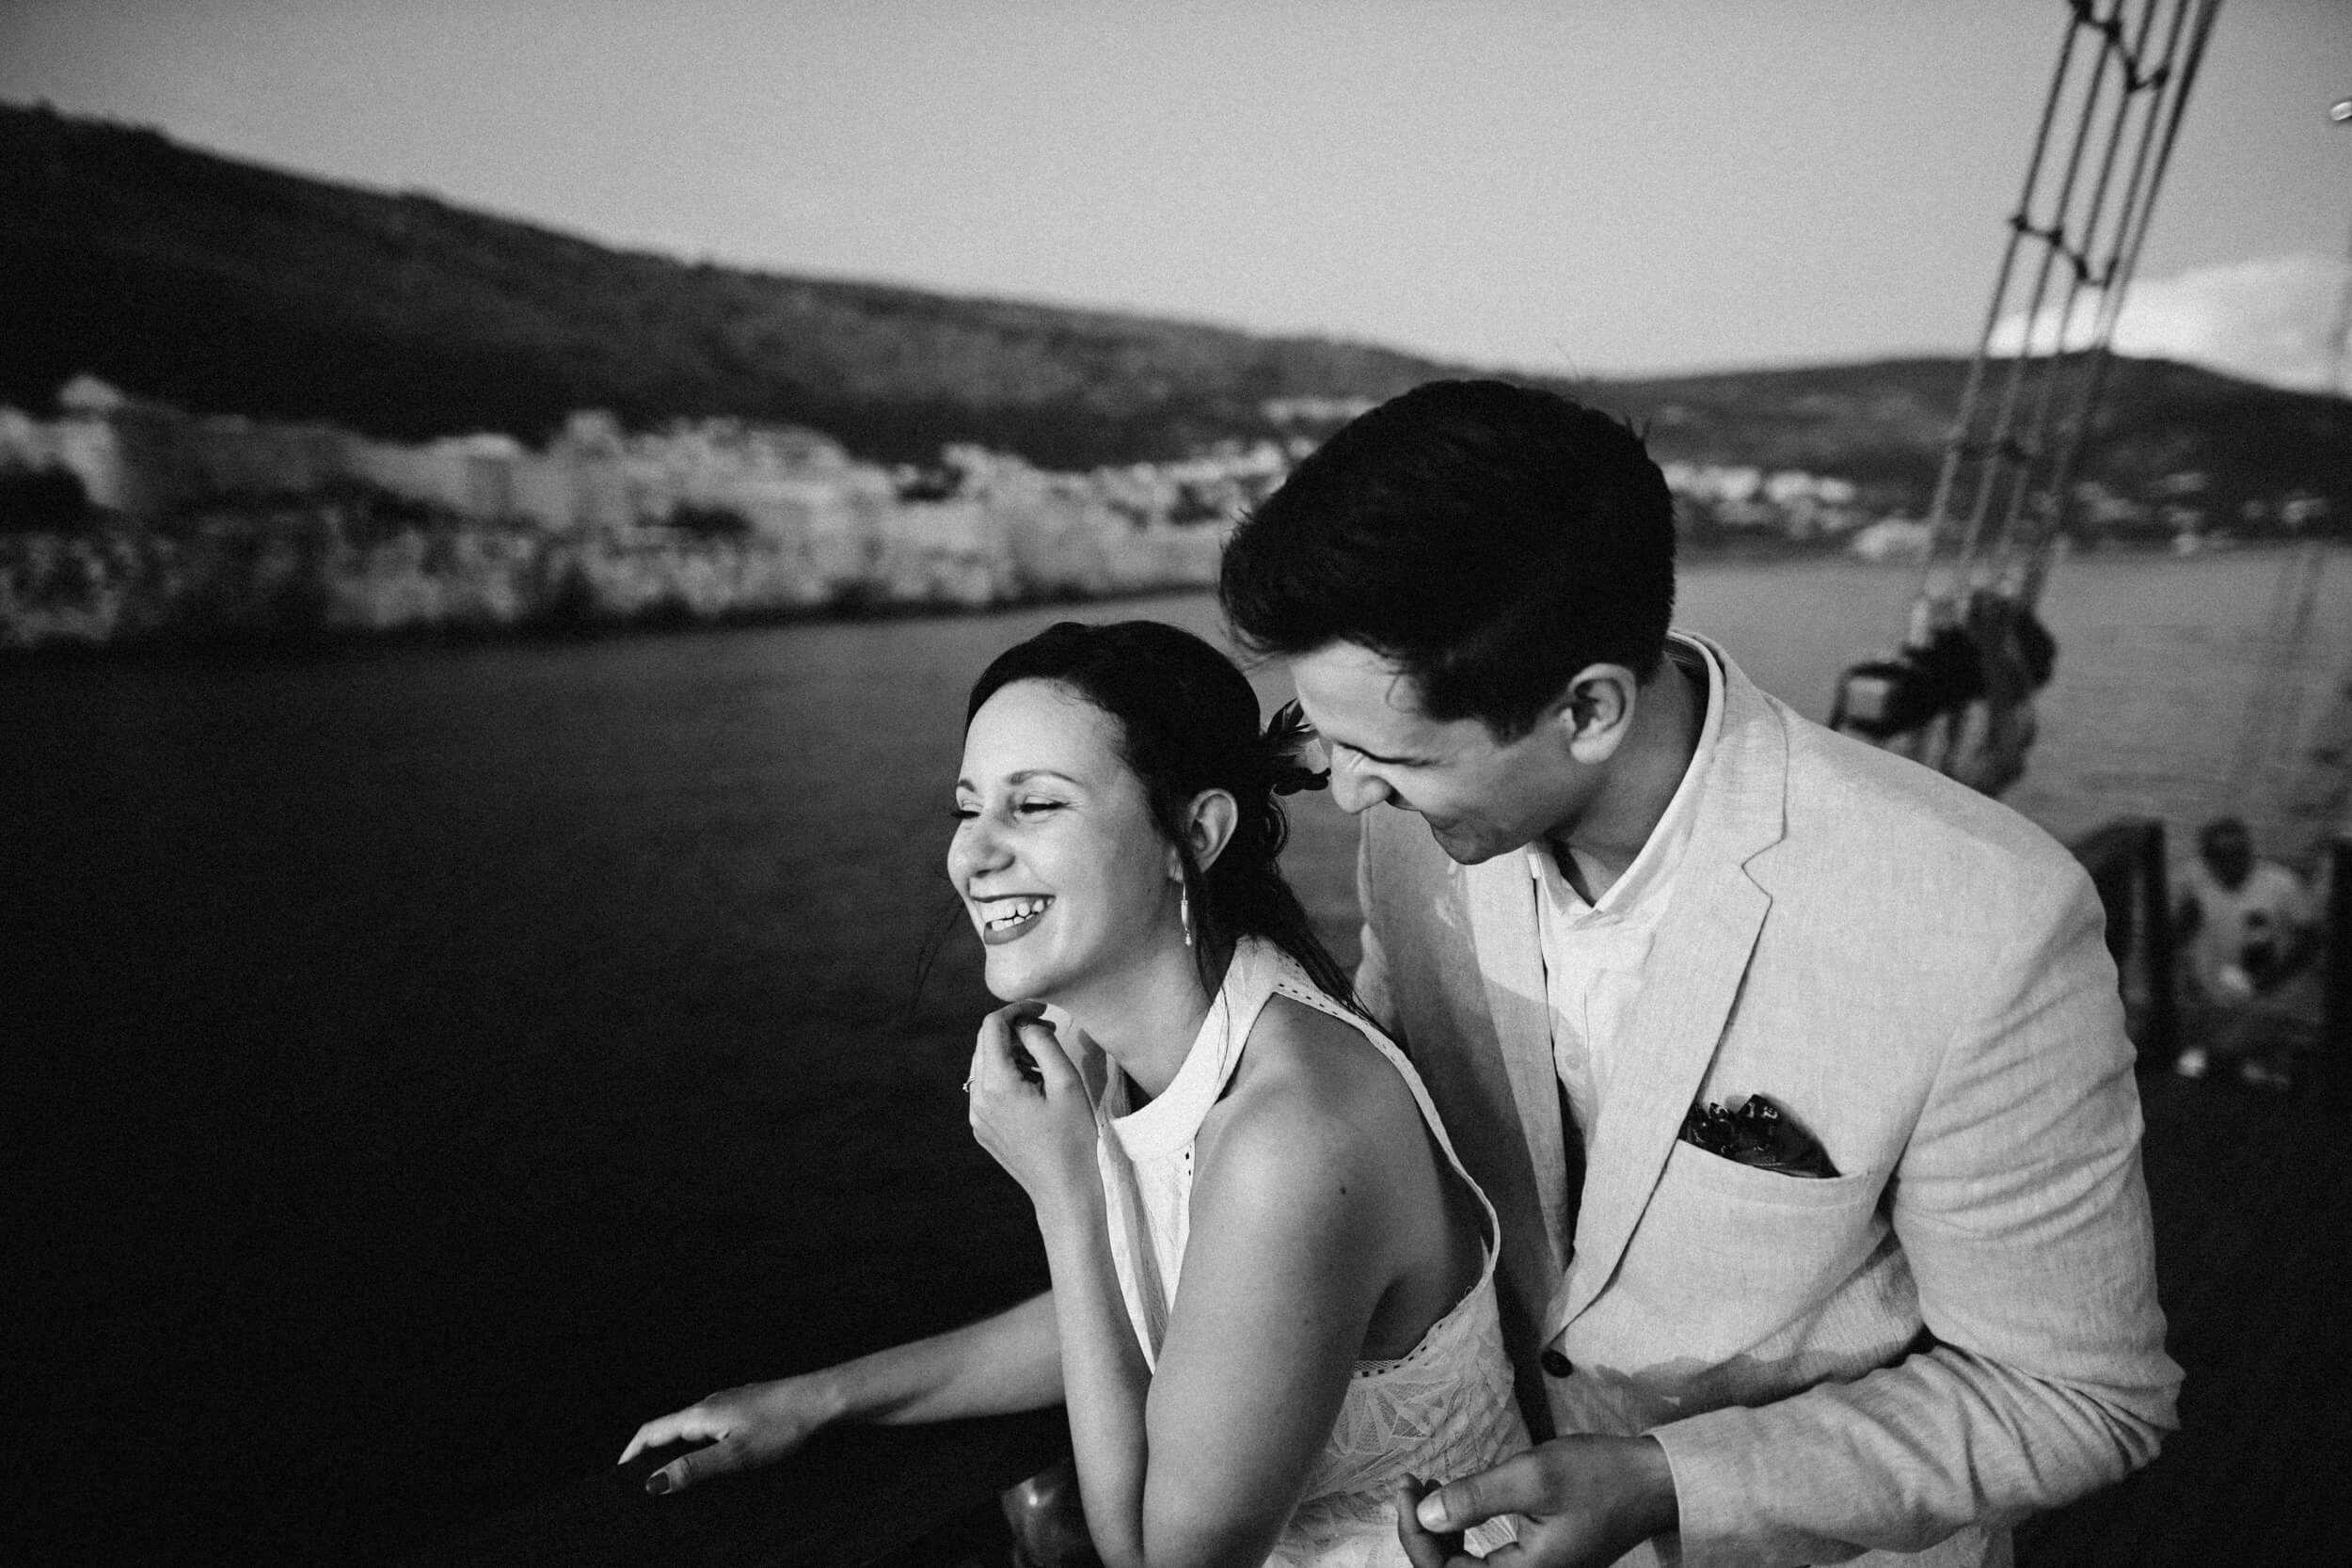 Dubrovnik karaka boat elopement matea stephan 15 | Croatia Elopement Photographer and Videographer